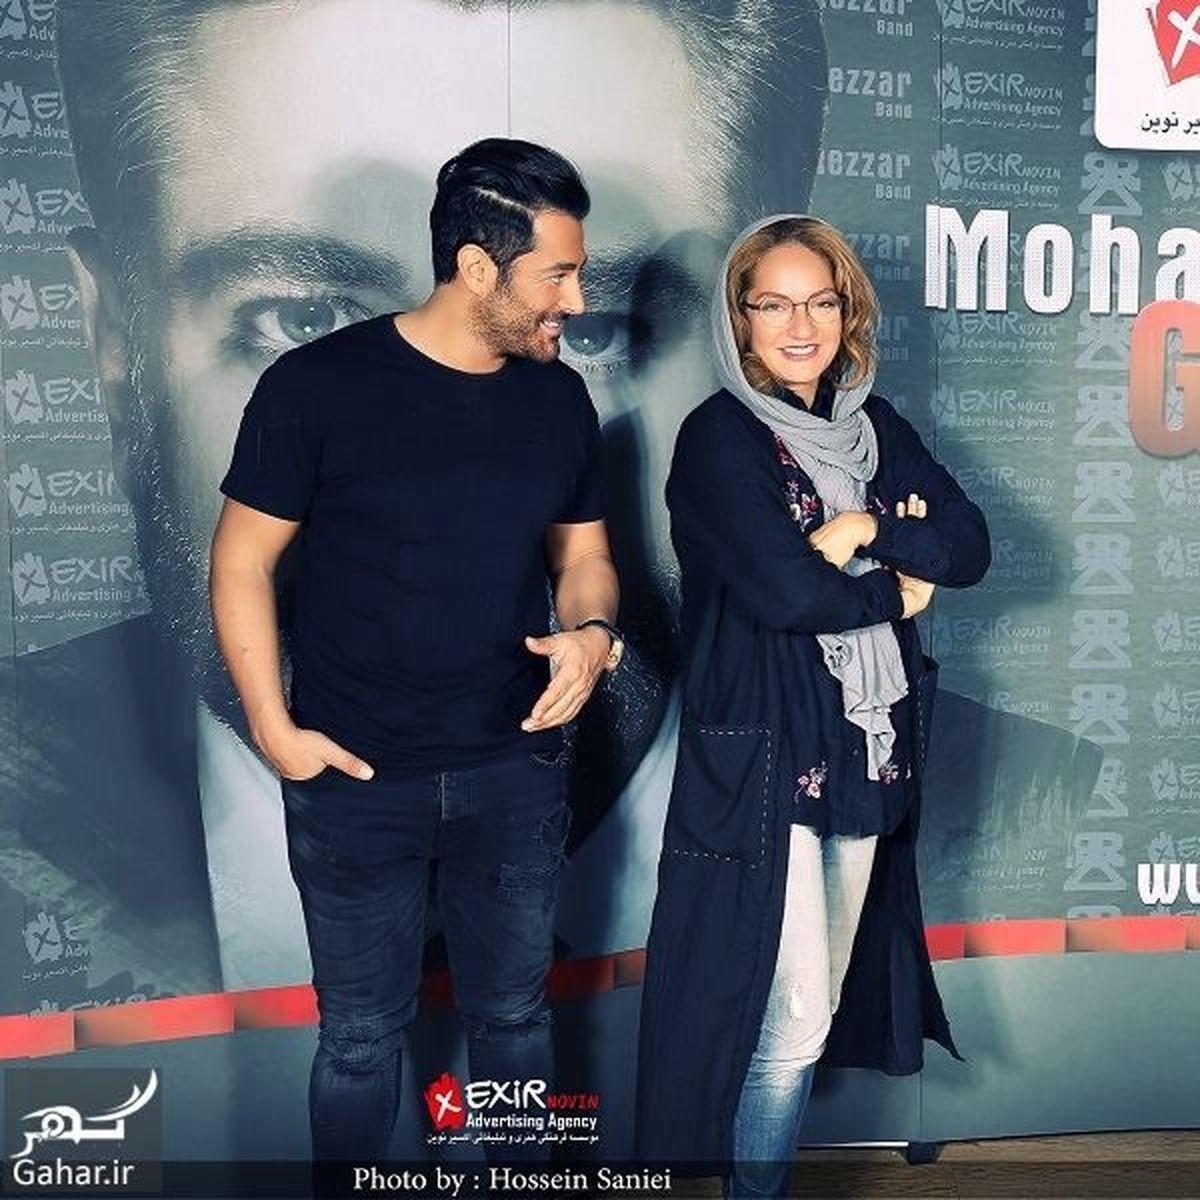 پست عاشقانه محمدرضا گلزار / عشق واقعی اقای سوپر استار فاش شد + عکس